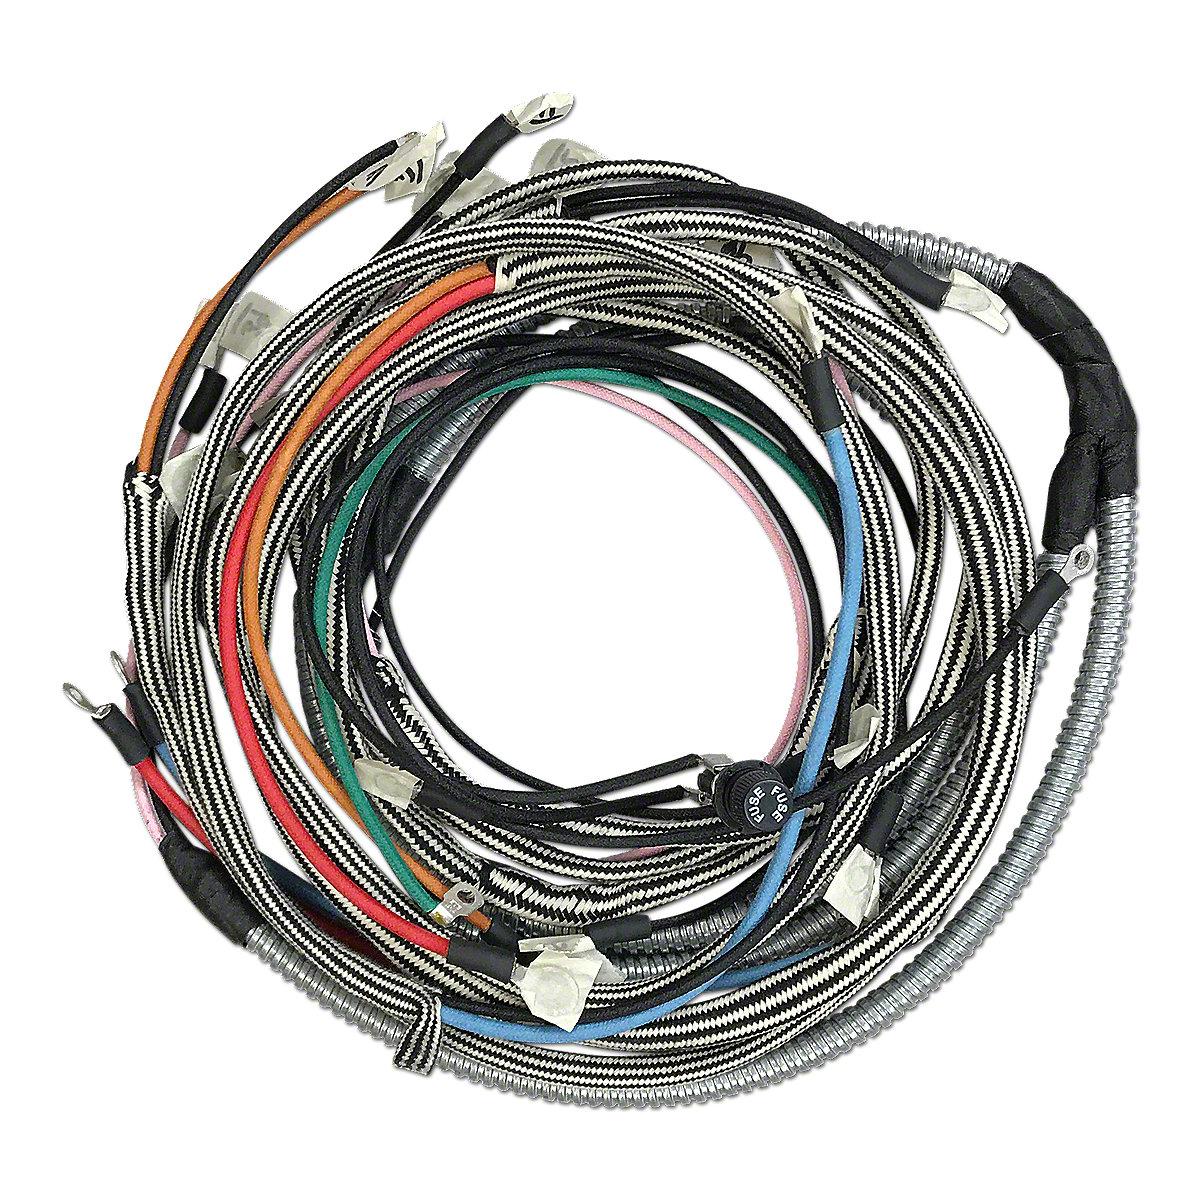 Restoration Quality Wiring Harness